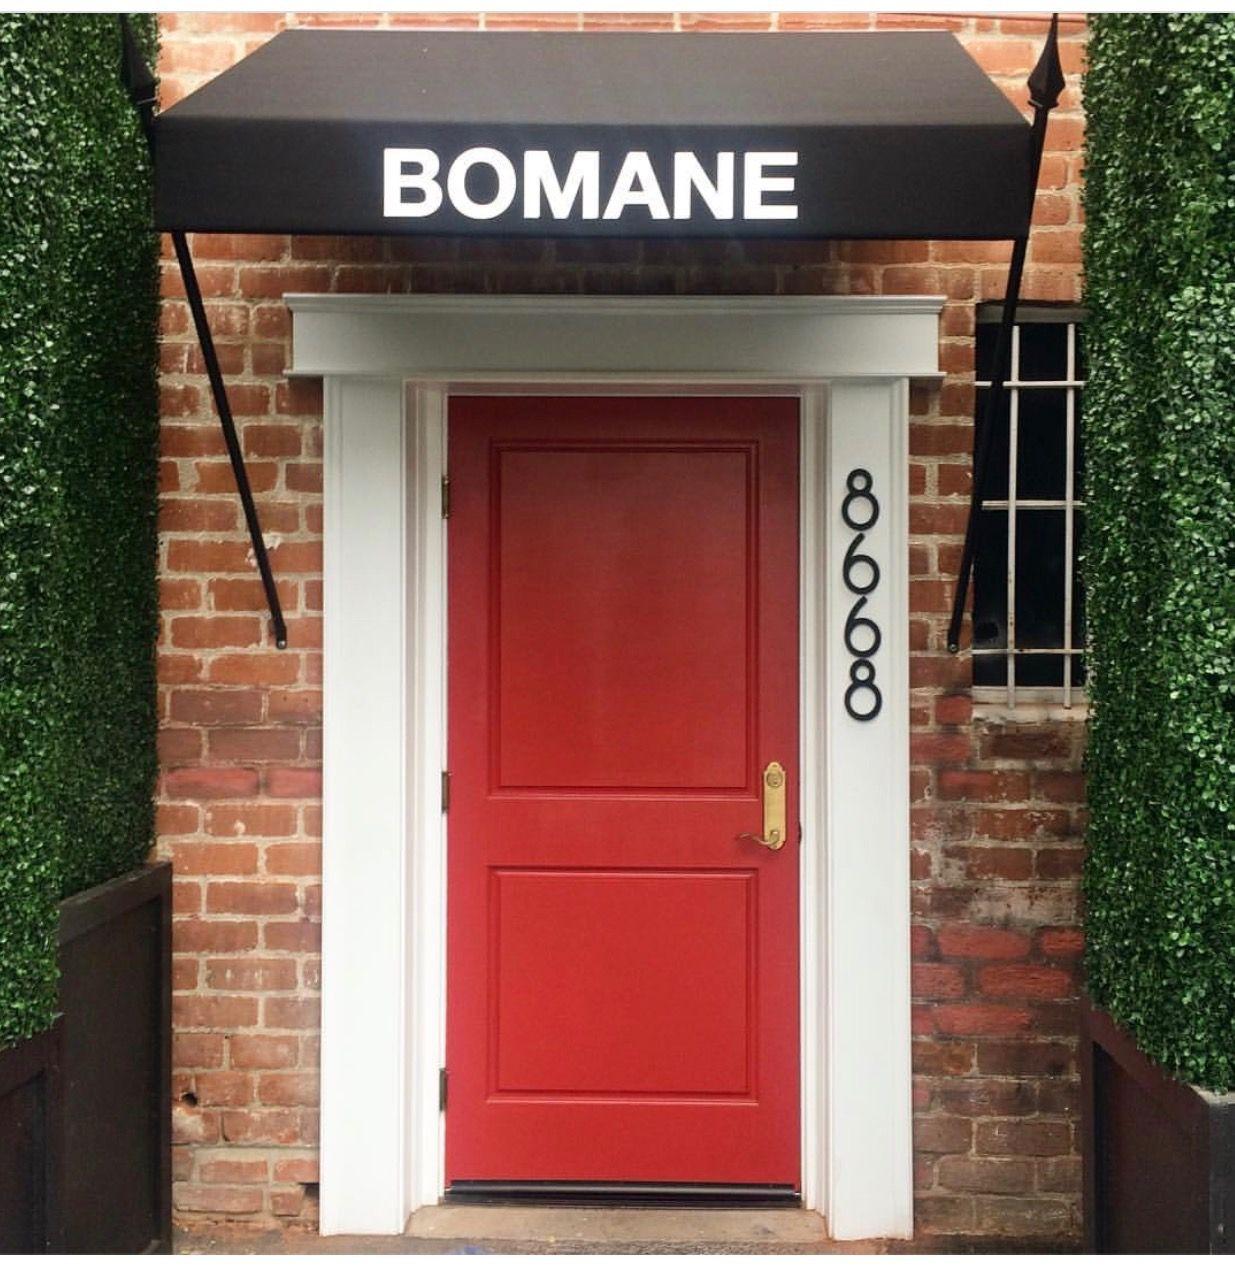 Bomane Salon Beverly Hills Ca Outdoor Decor Beverly Hills Home